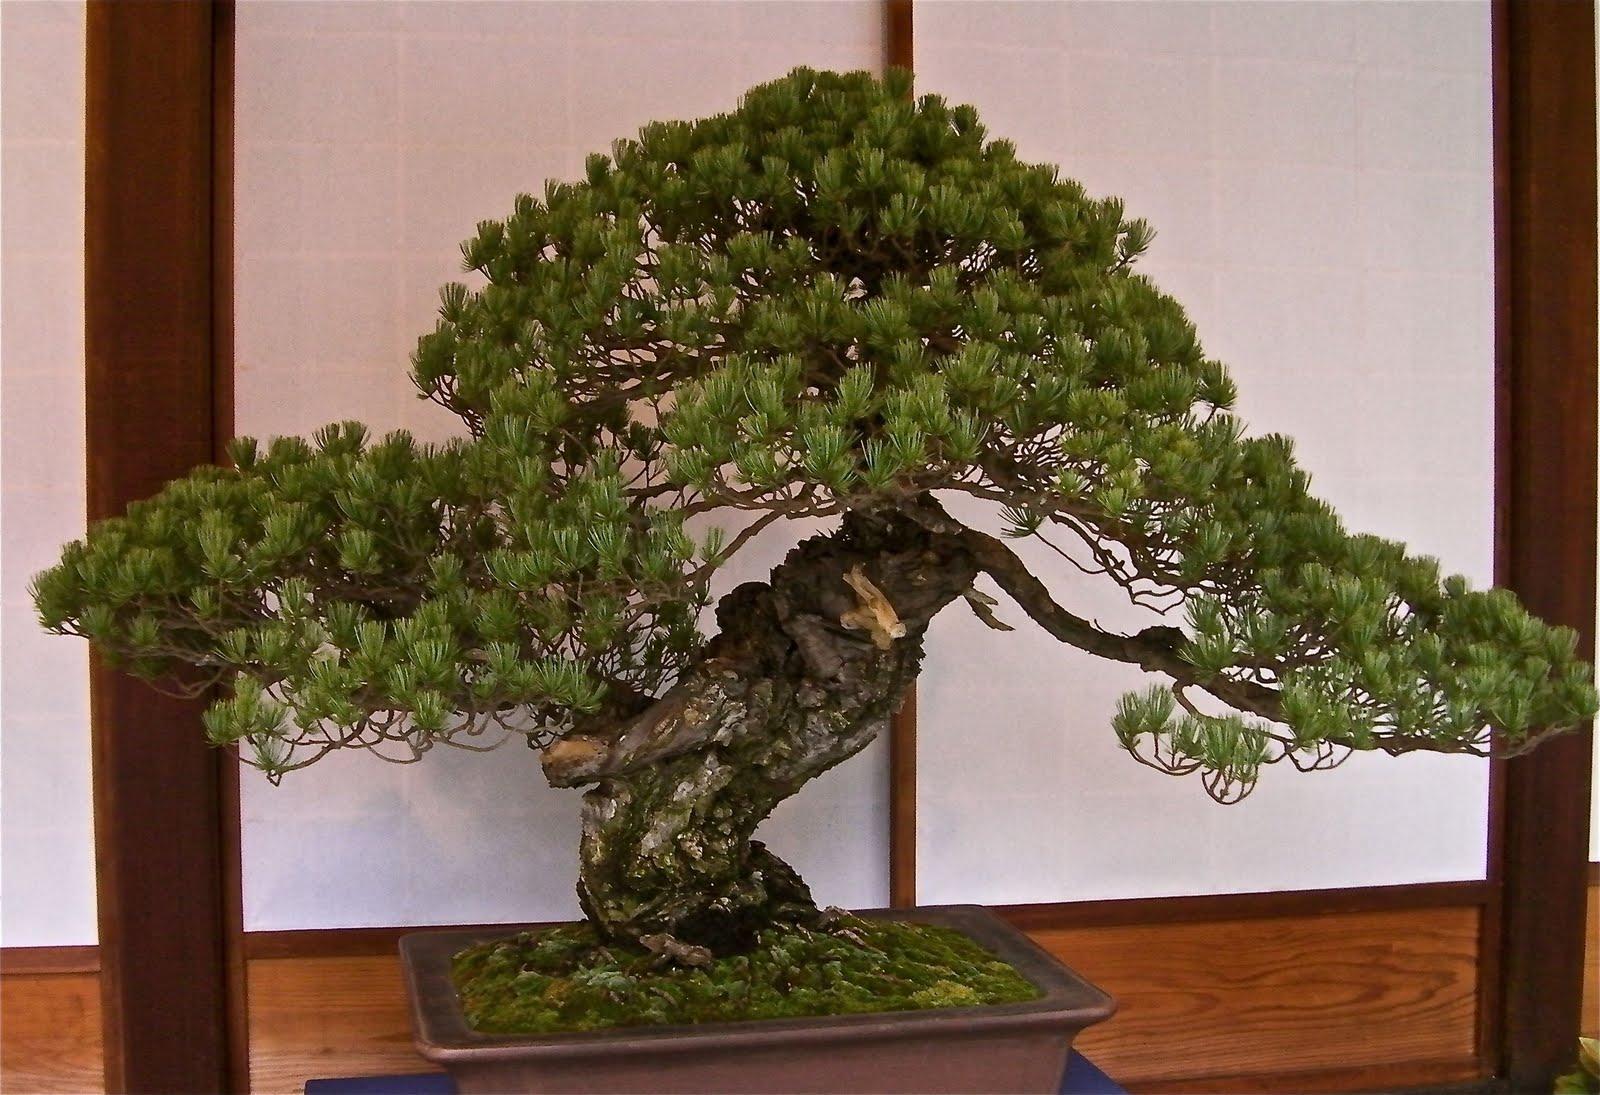 Tokugawa Iemitsu's Pine